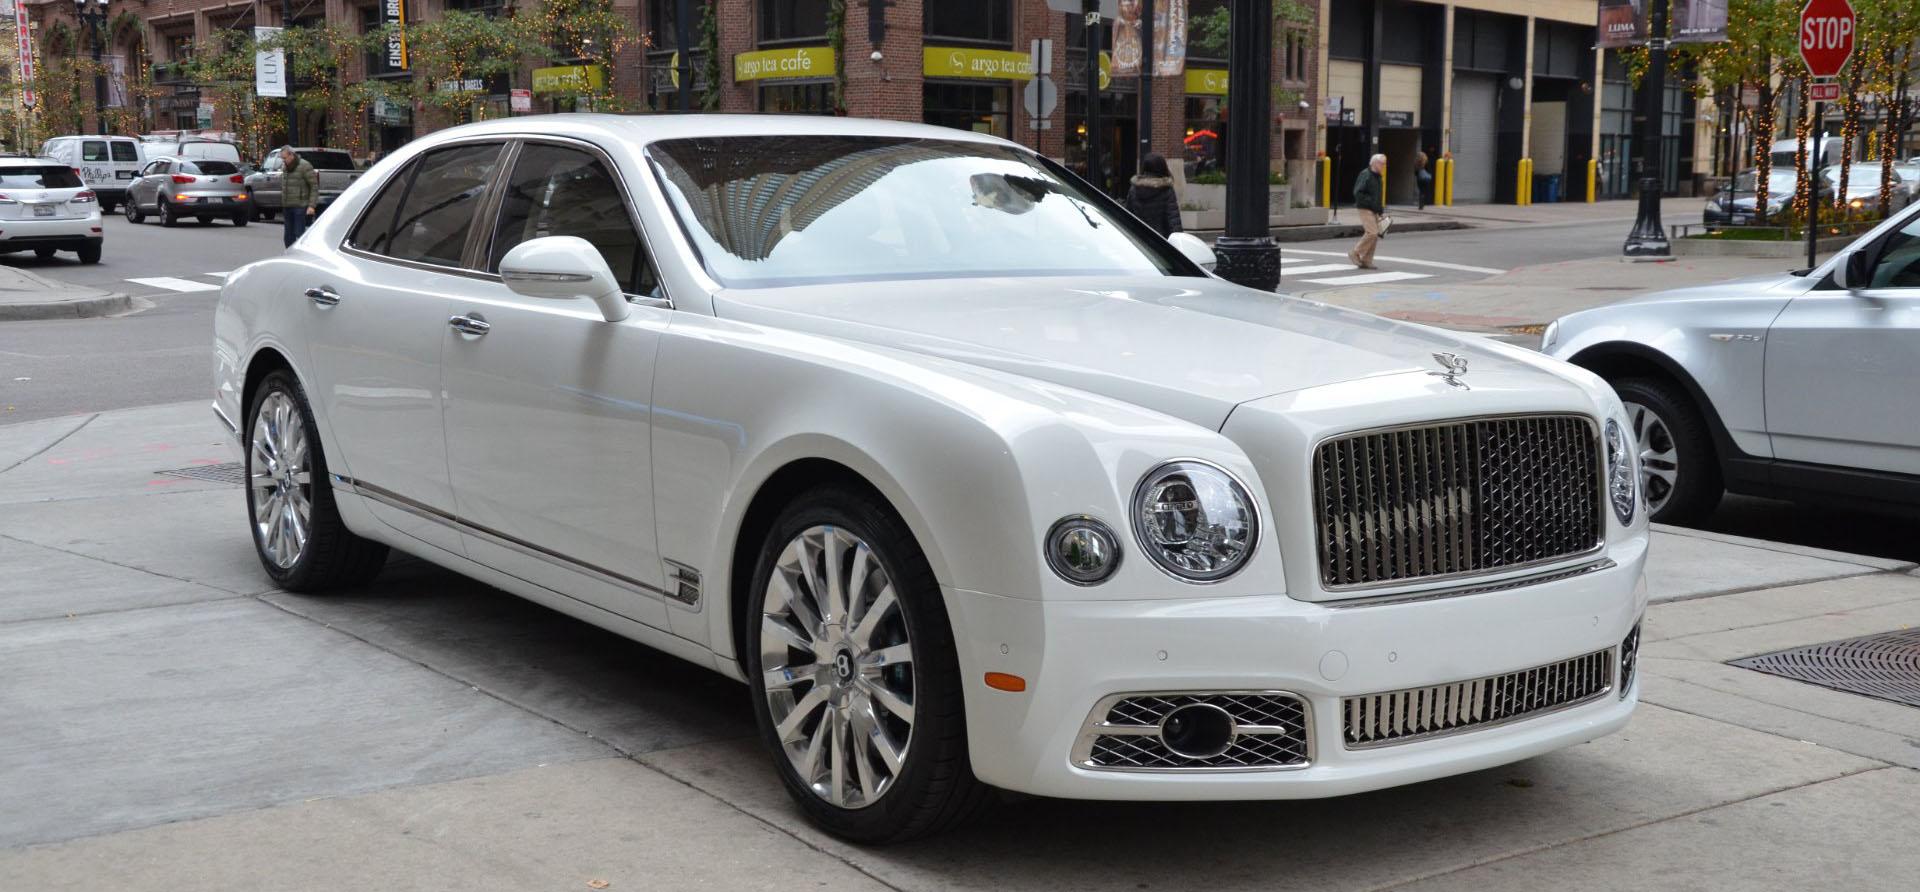 uk-prestige-car-hire-Bentley-mulsanne4